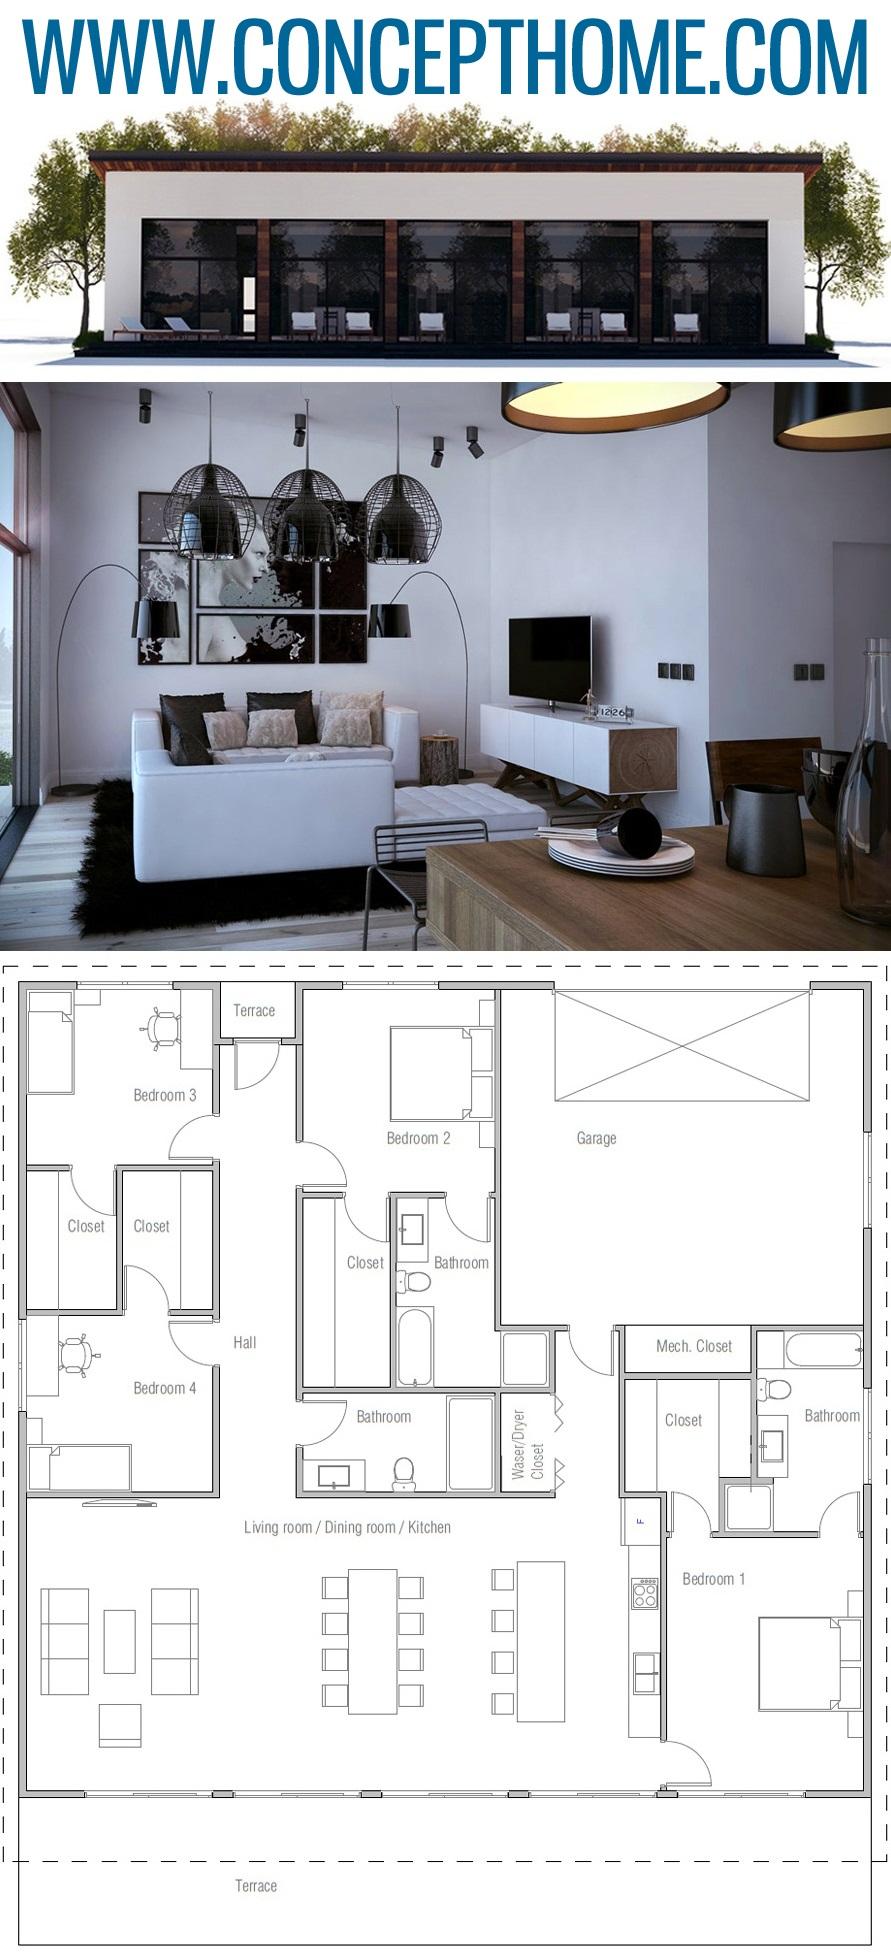 Home Plan Ch443 Modular Home Plans Modern Floor Plans Small House Plans